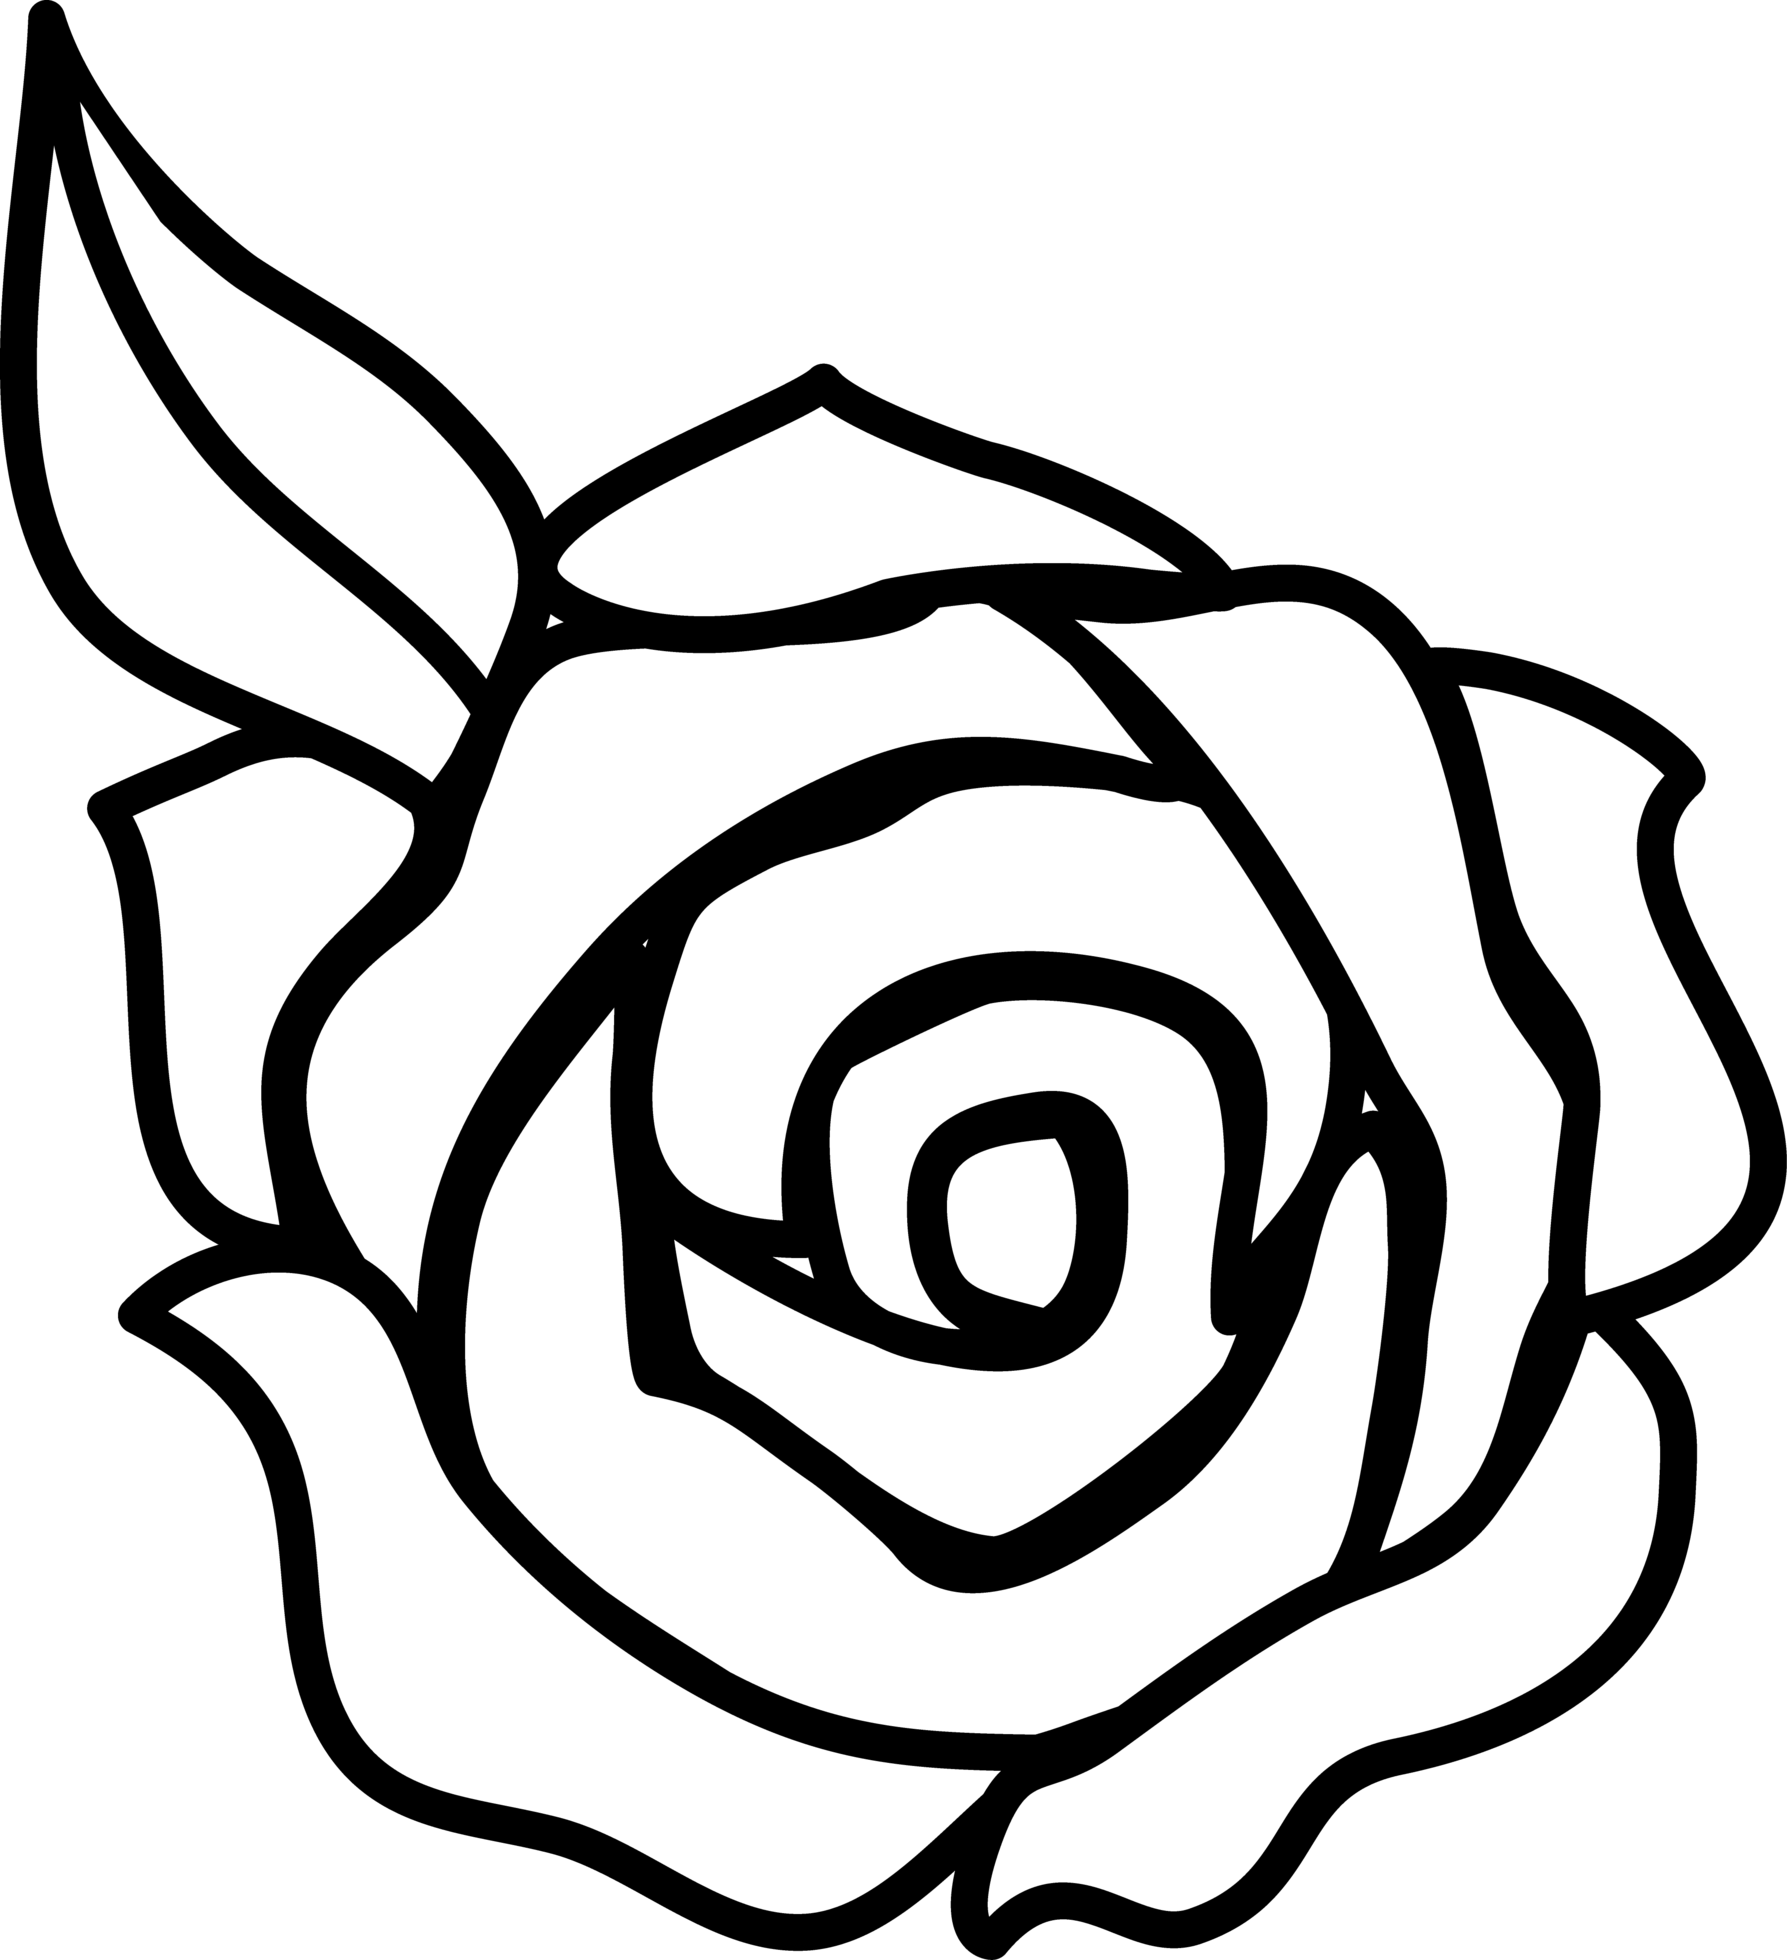 Drawn rose simple > journal Pics Pics Flower